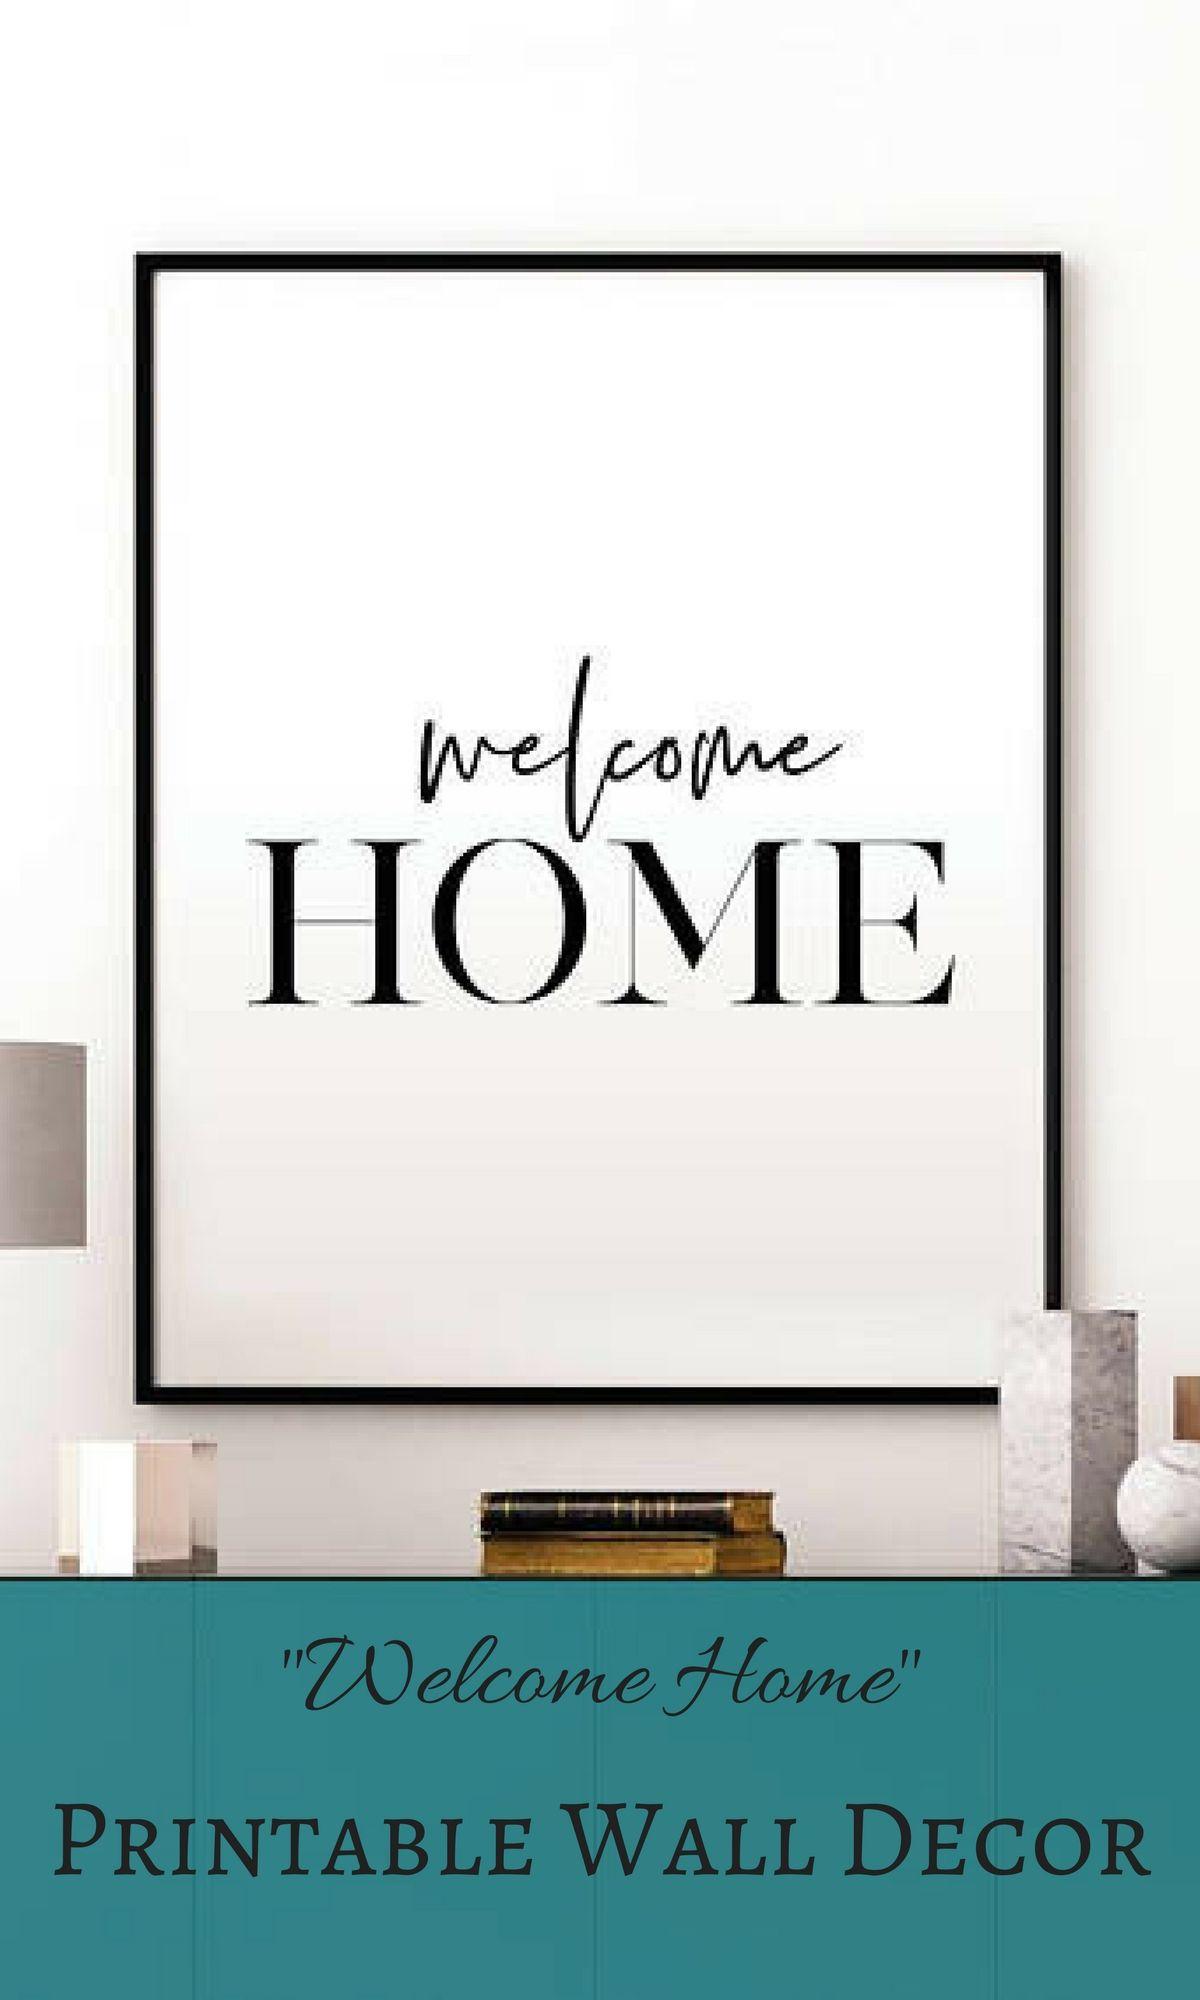 welcome home sign printable - Kubre.euforic.co